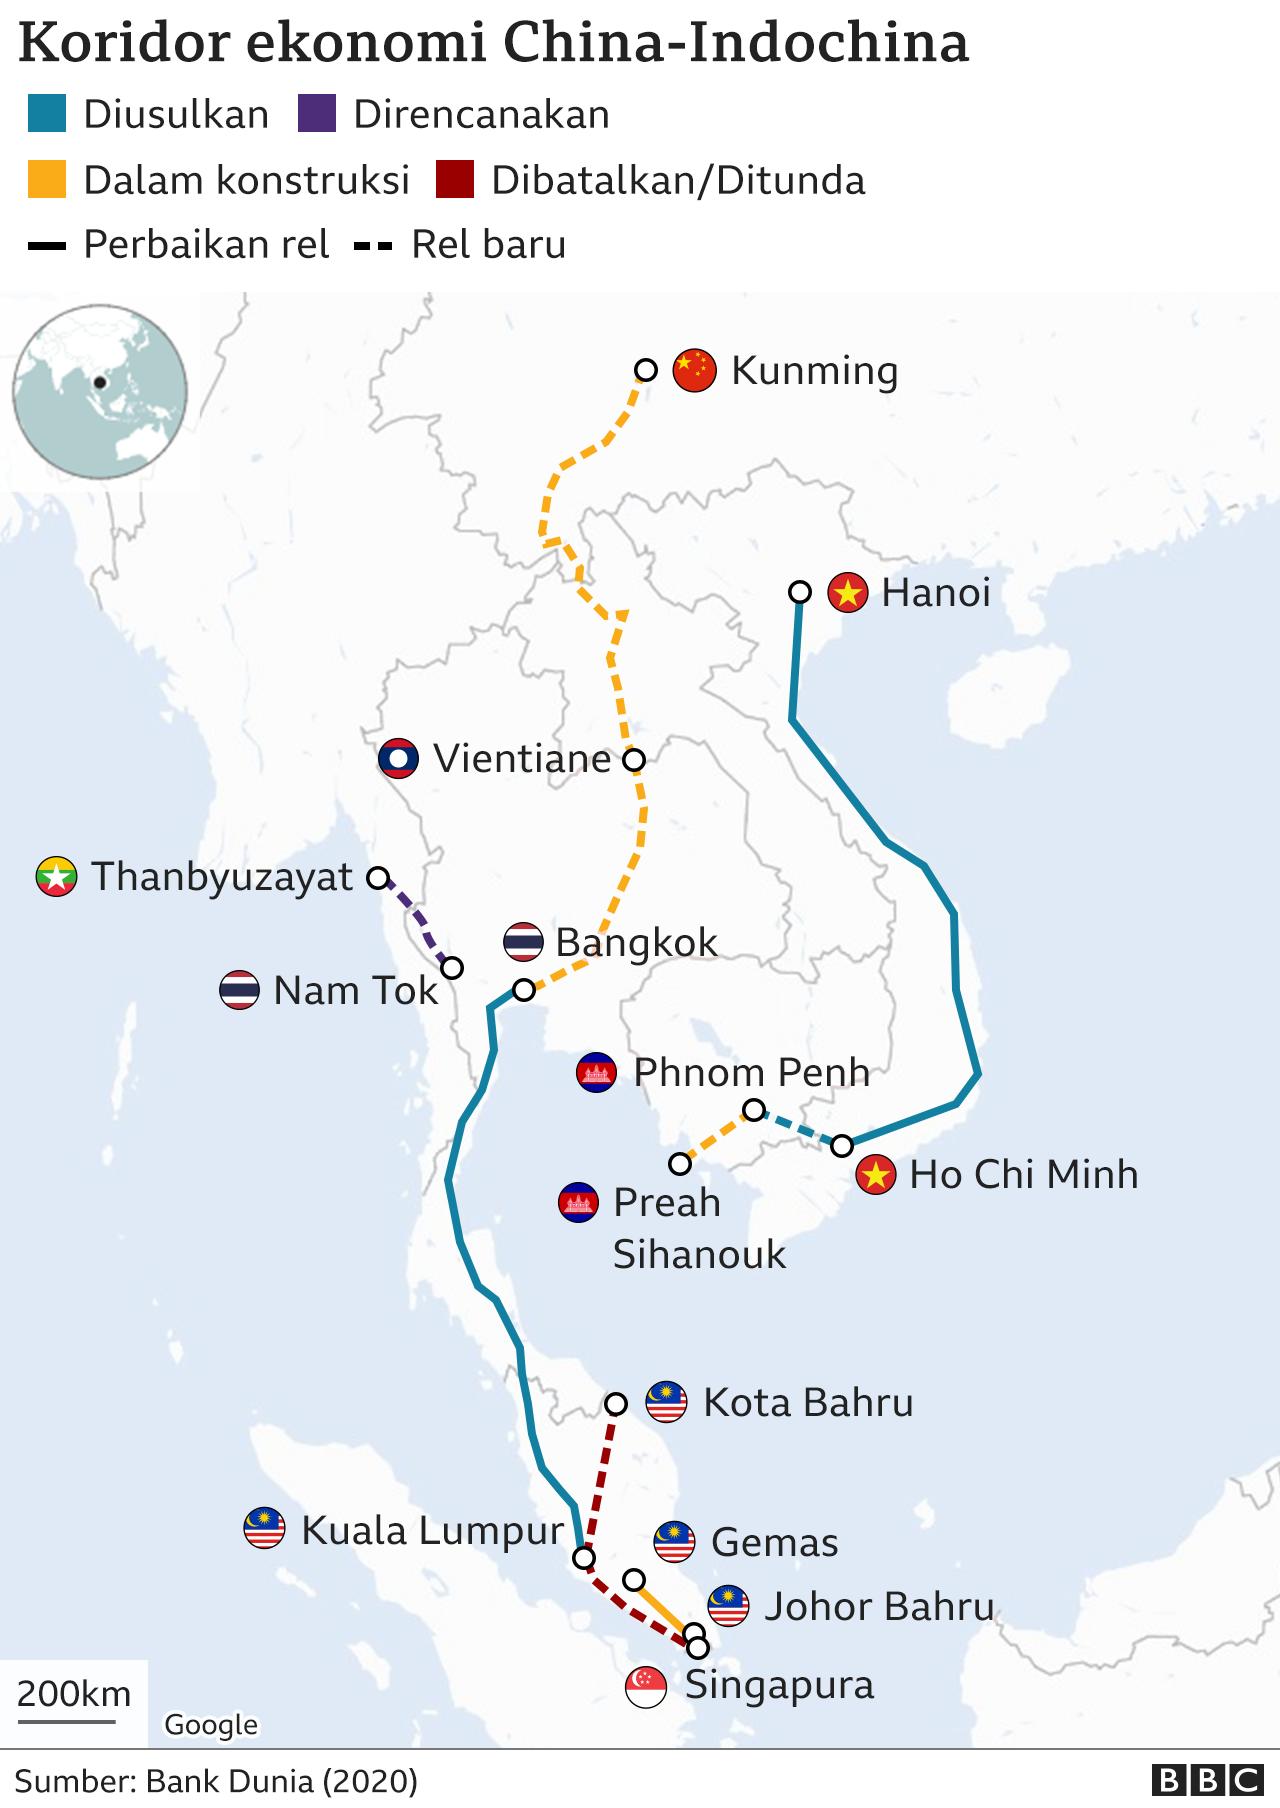 Koridor ekonomi China-Indochina